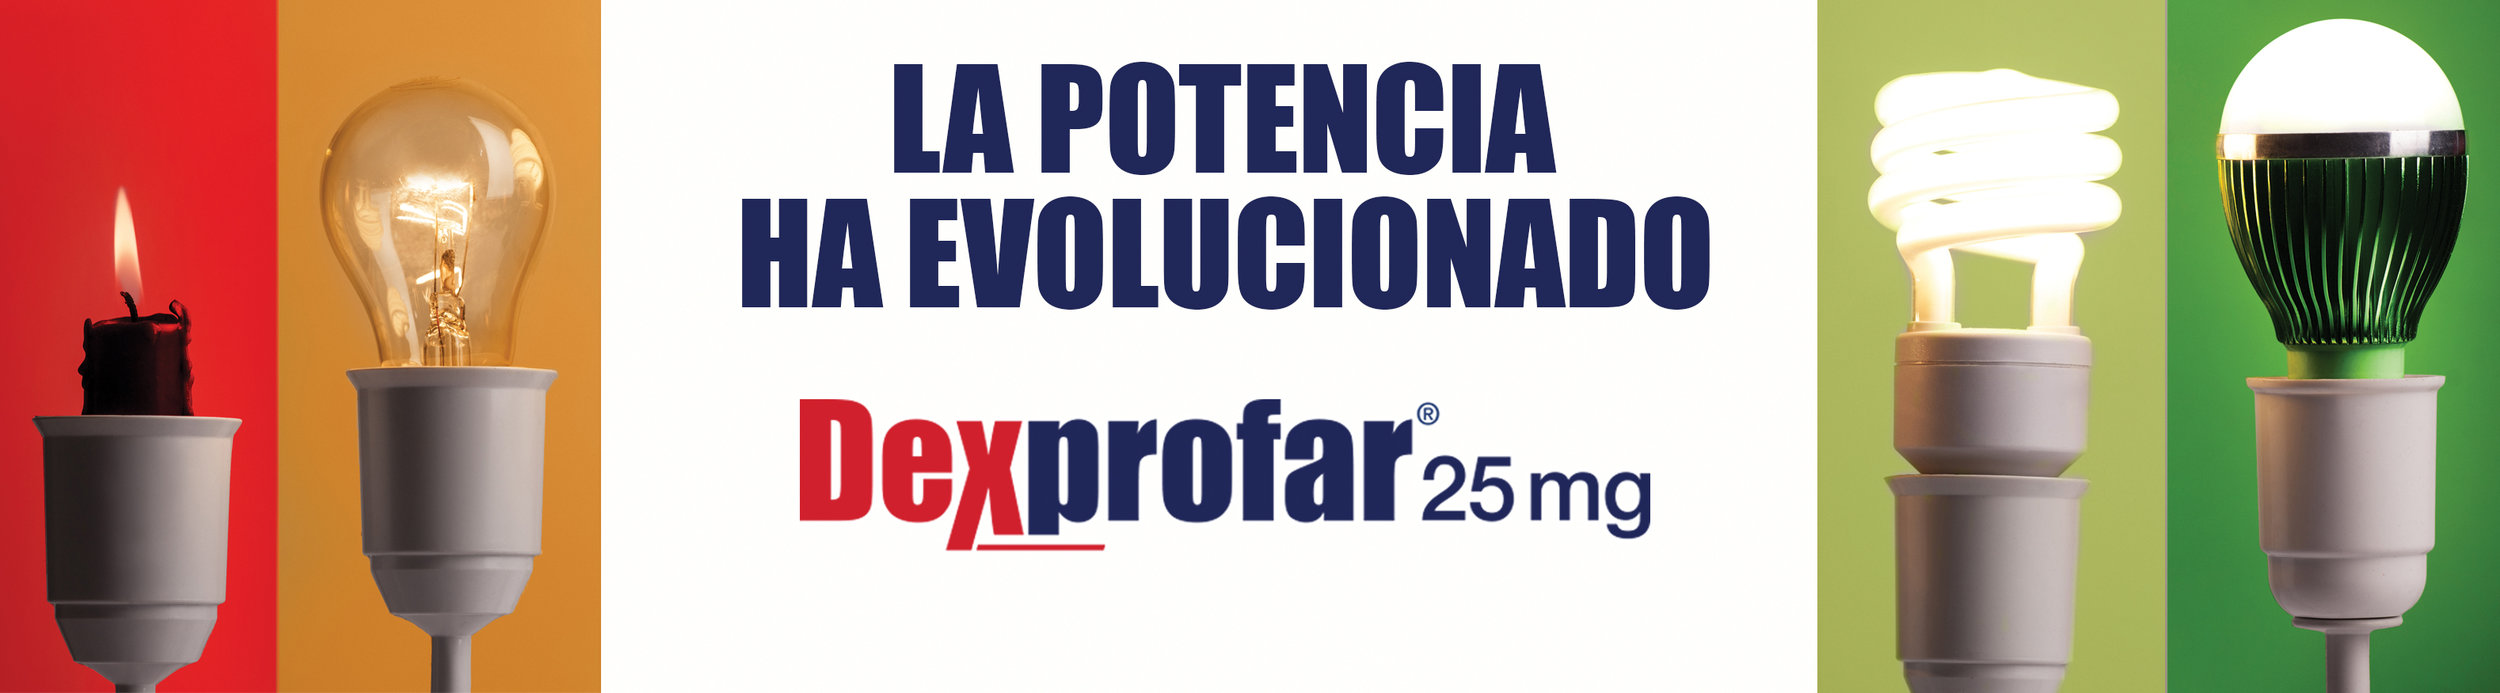 Banner Dexprofar